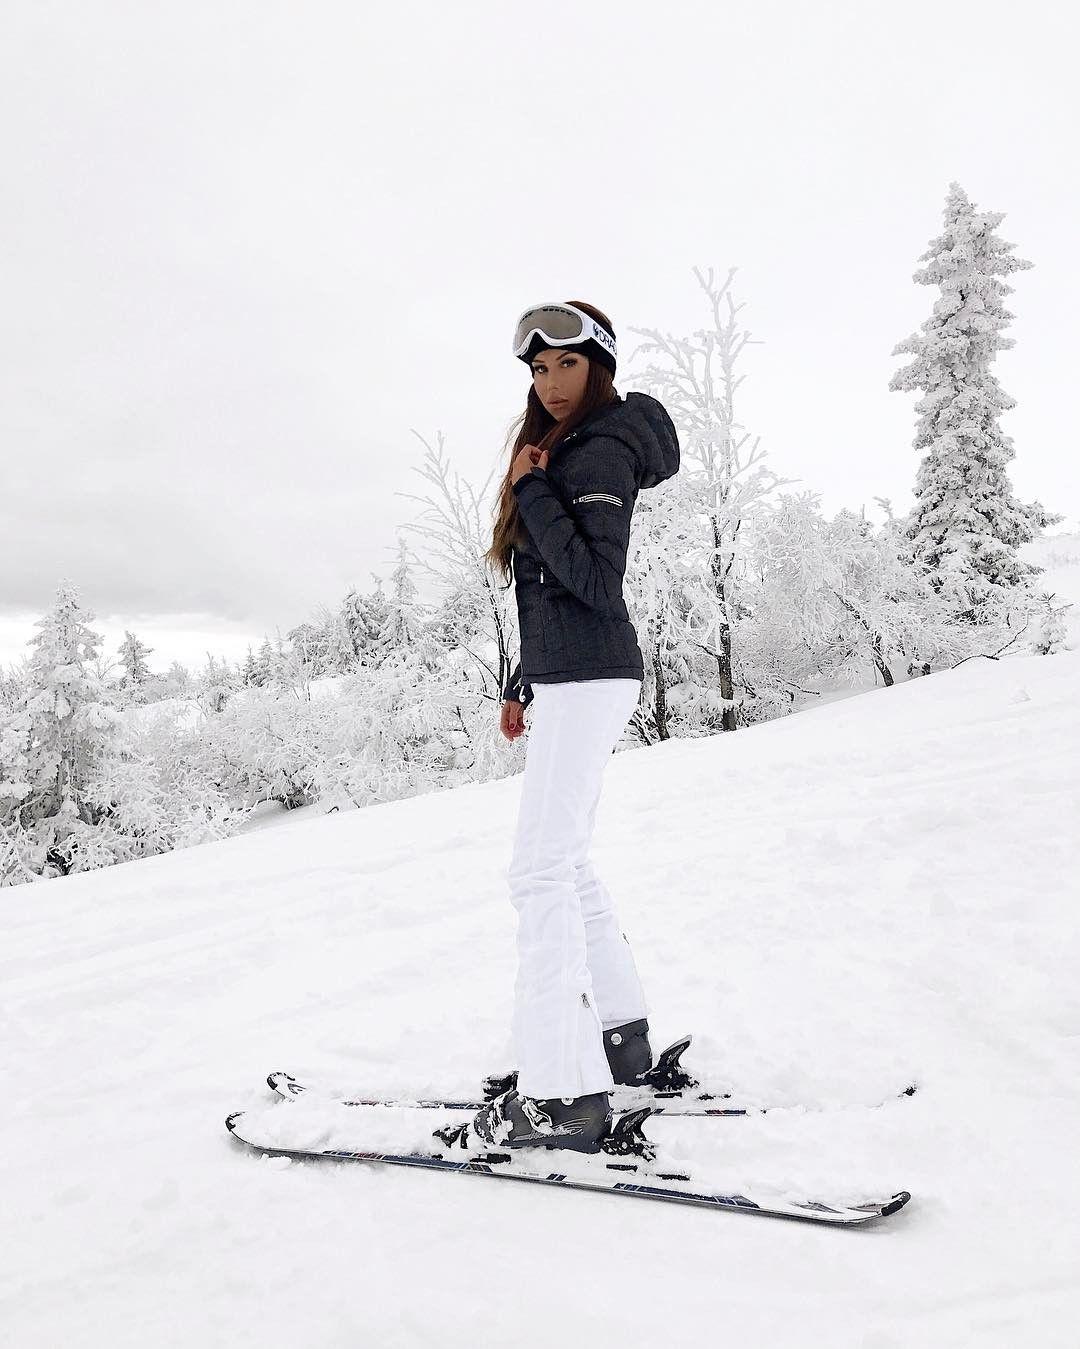 Pin Van Piper Sage Op Ski Trip Skien Sneeuw Outfit Snowboarden